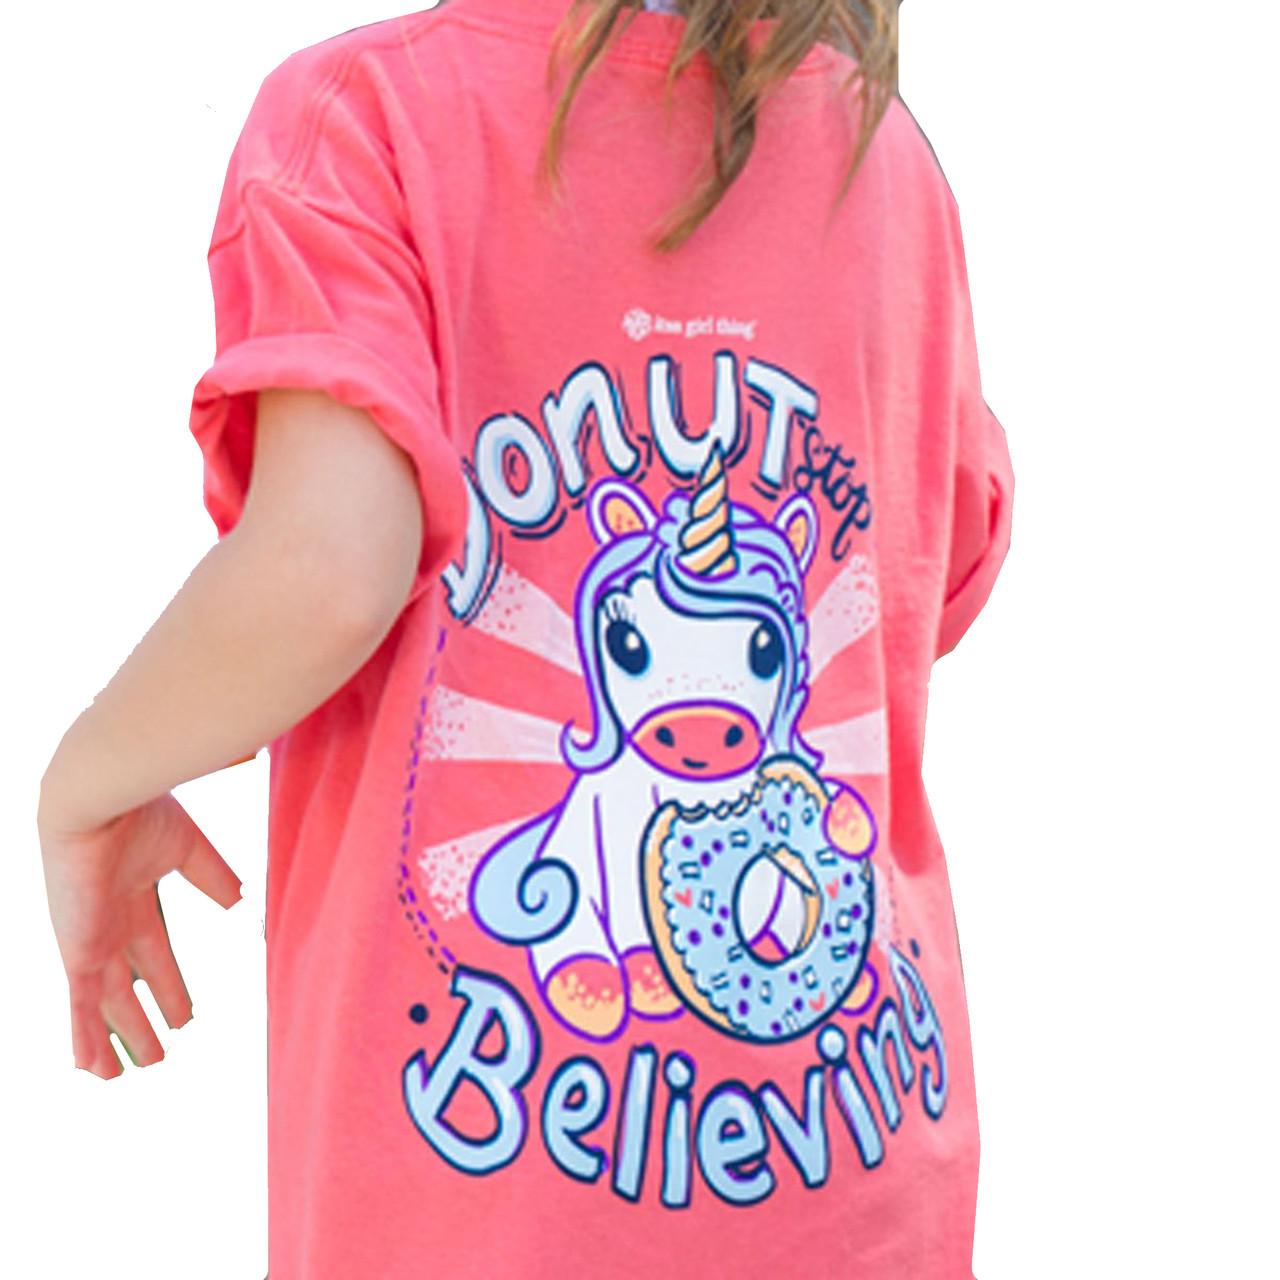 b673d8a37e5b Itsa Girl Thing Youth Donut Stop Believing Short Sleeve T-shirt - Trenz  Shirt Company